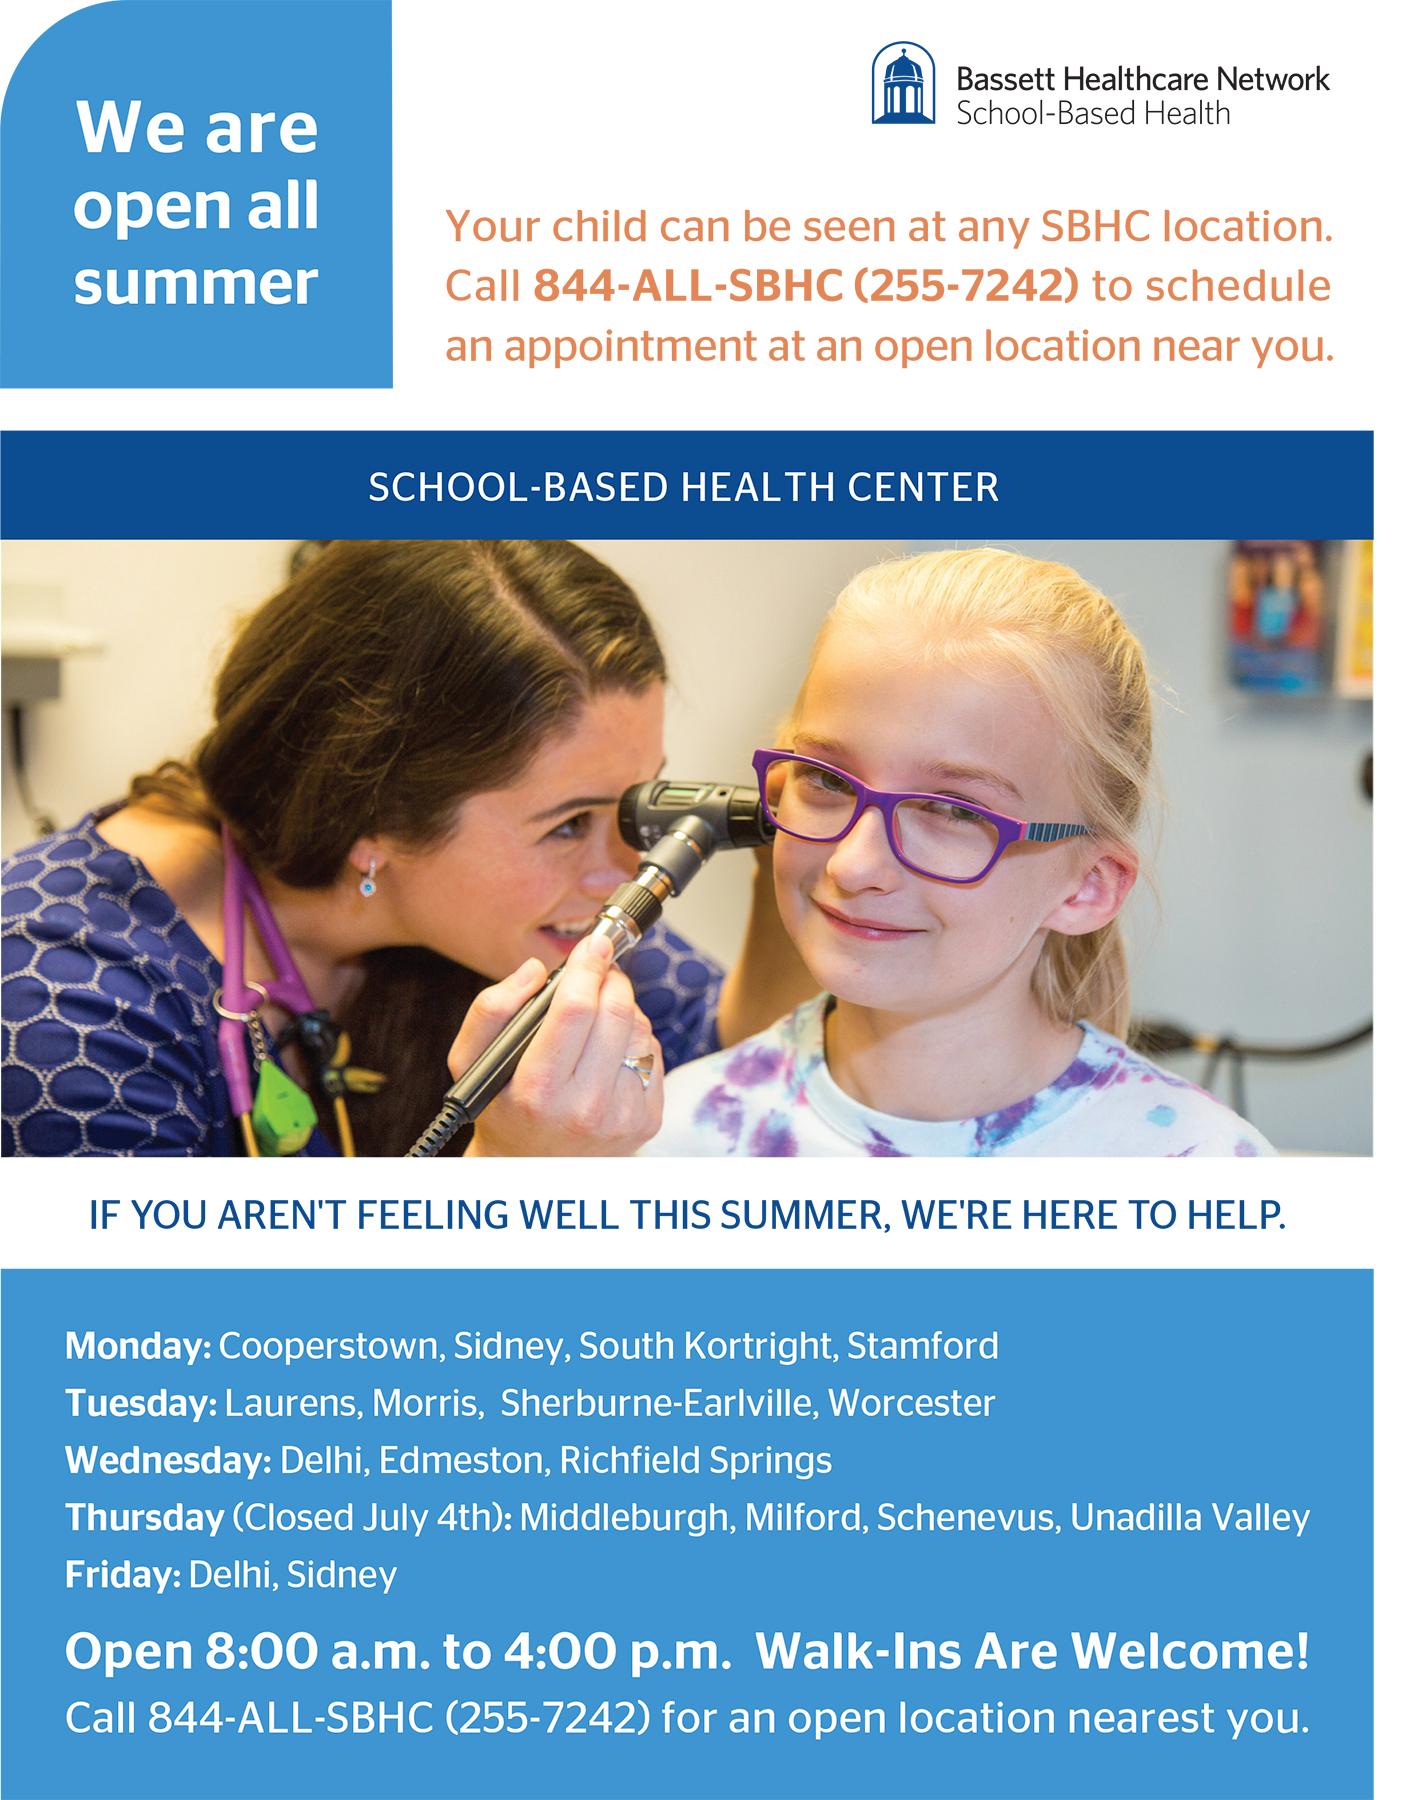 School-based health center summer info